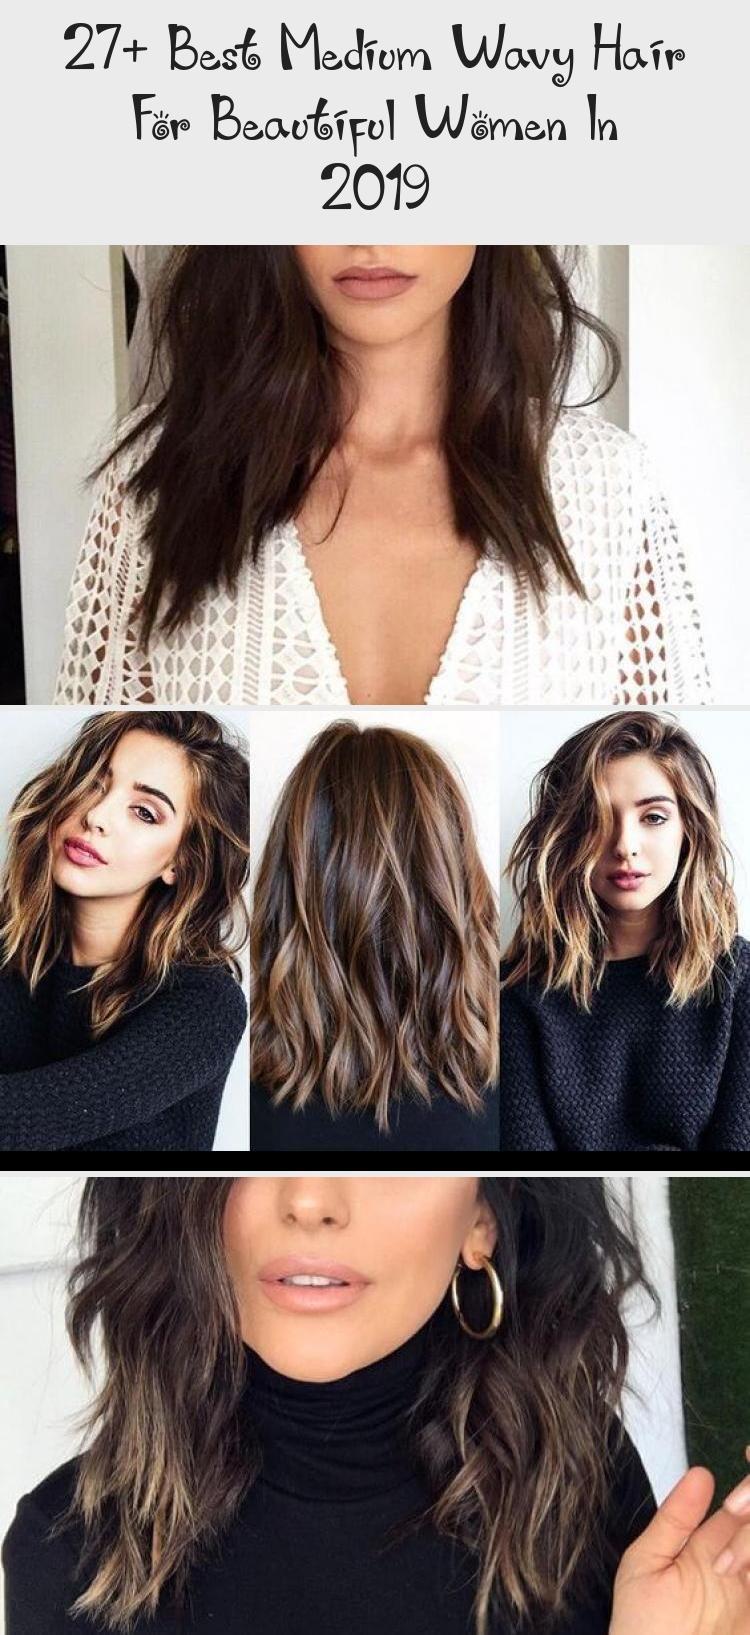 Cute Hairstyles for Medium Length Thick Wavy Hair